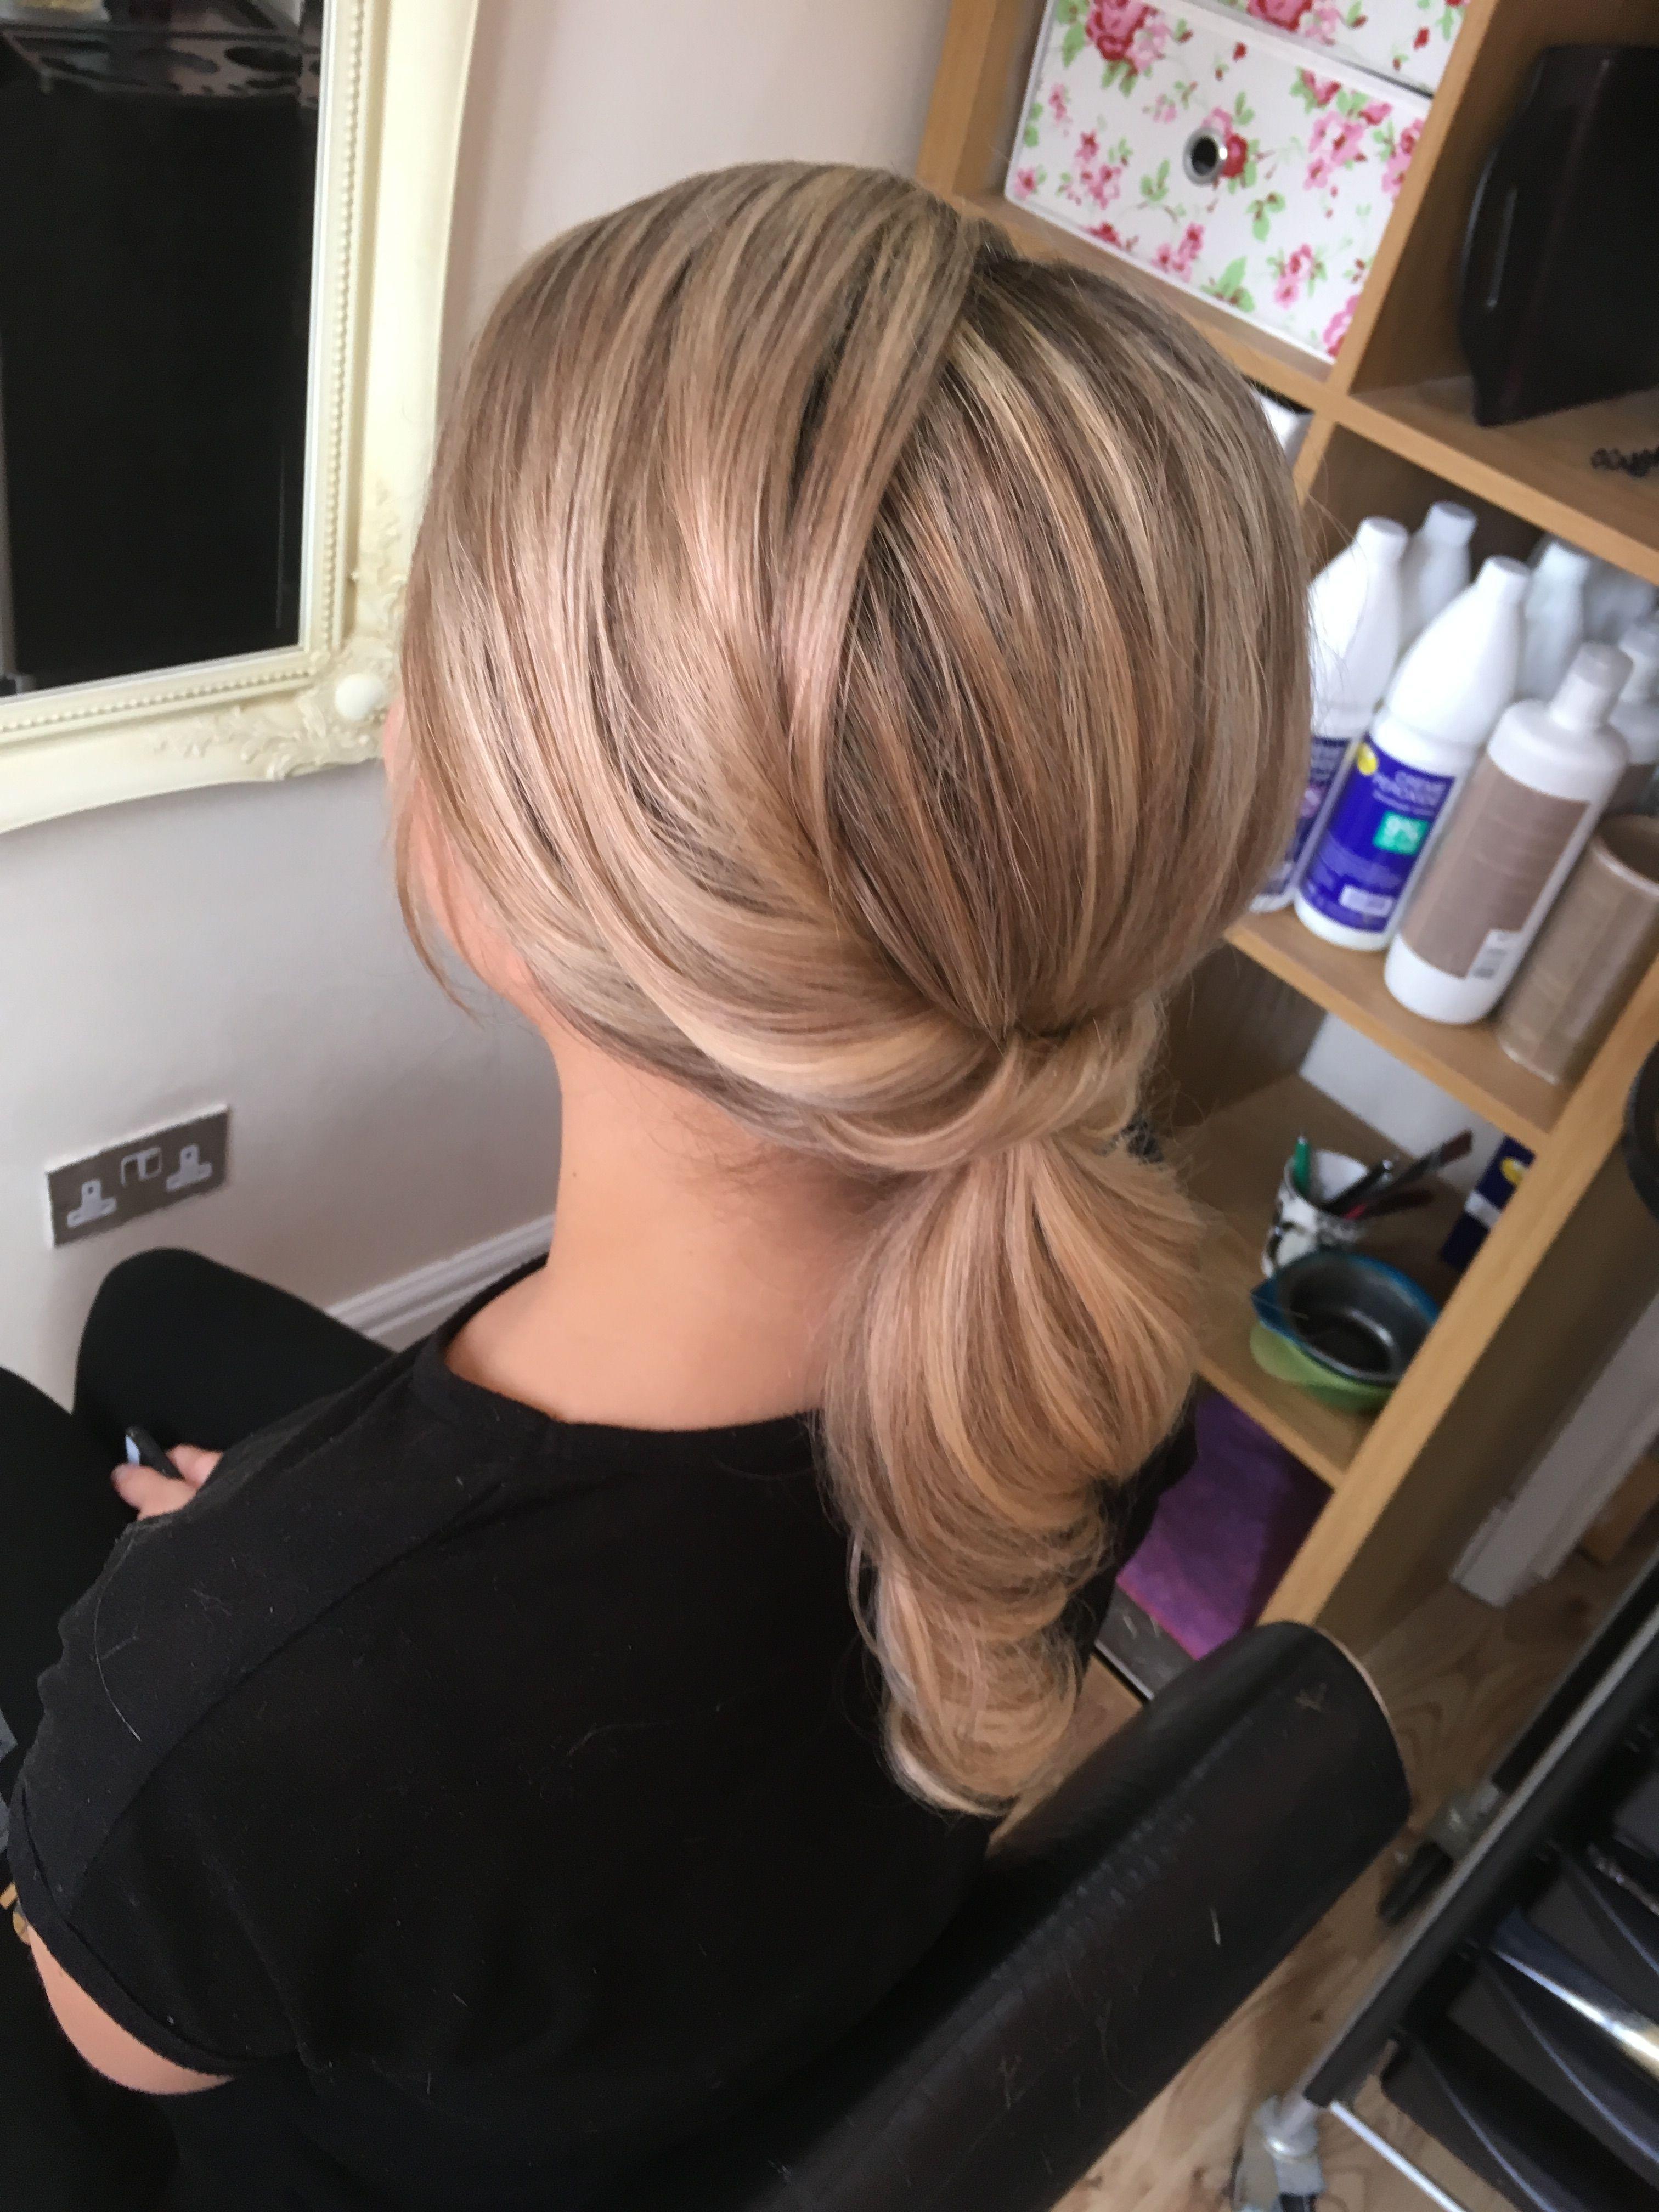 Curled pony simple updo hair style wedding hair pinterest